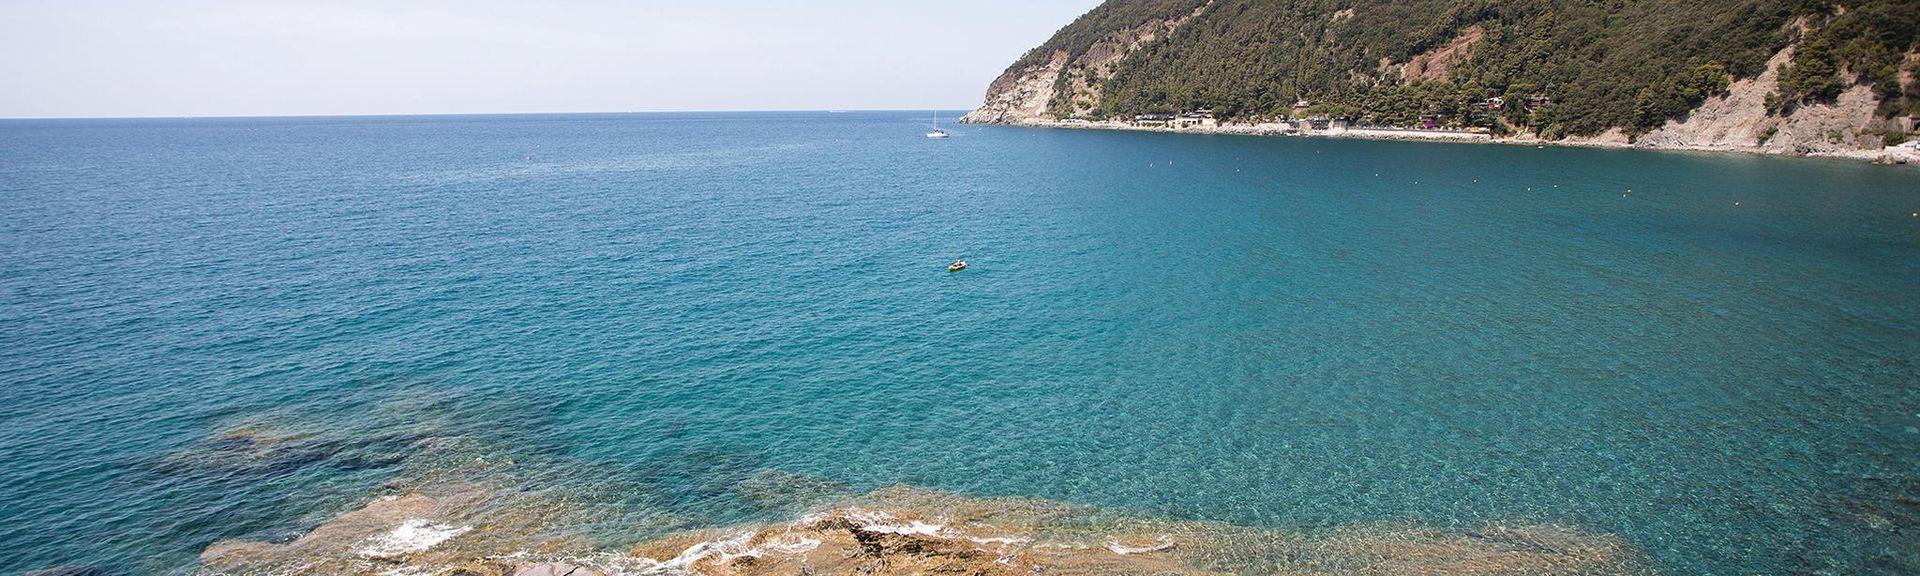 Bonassola Beach, Bonassola, Italy